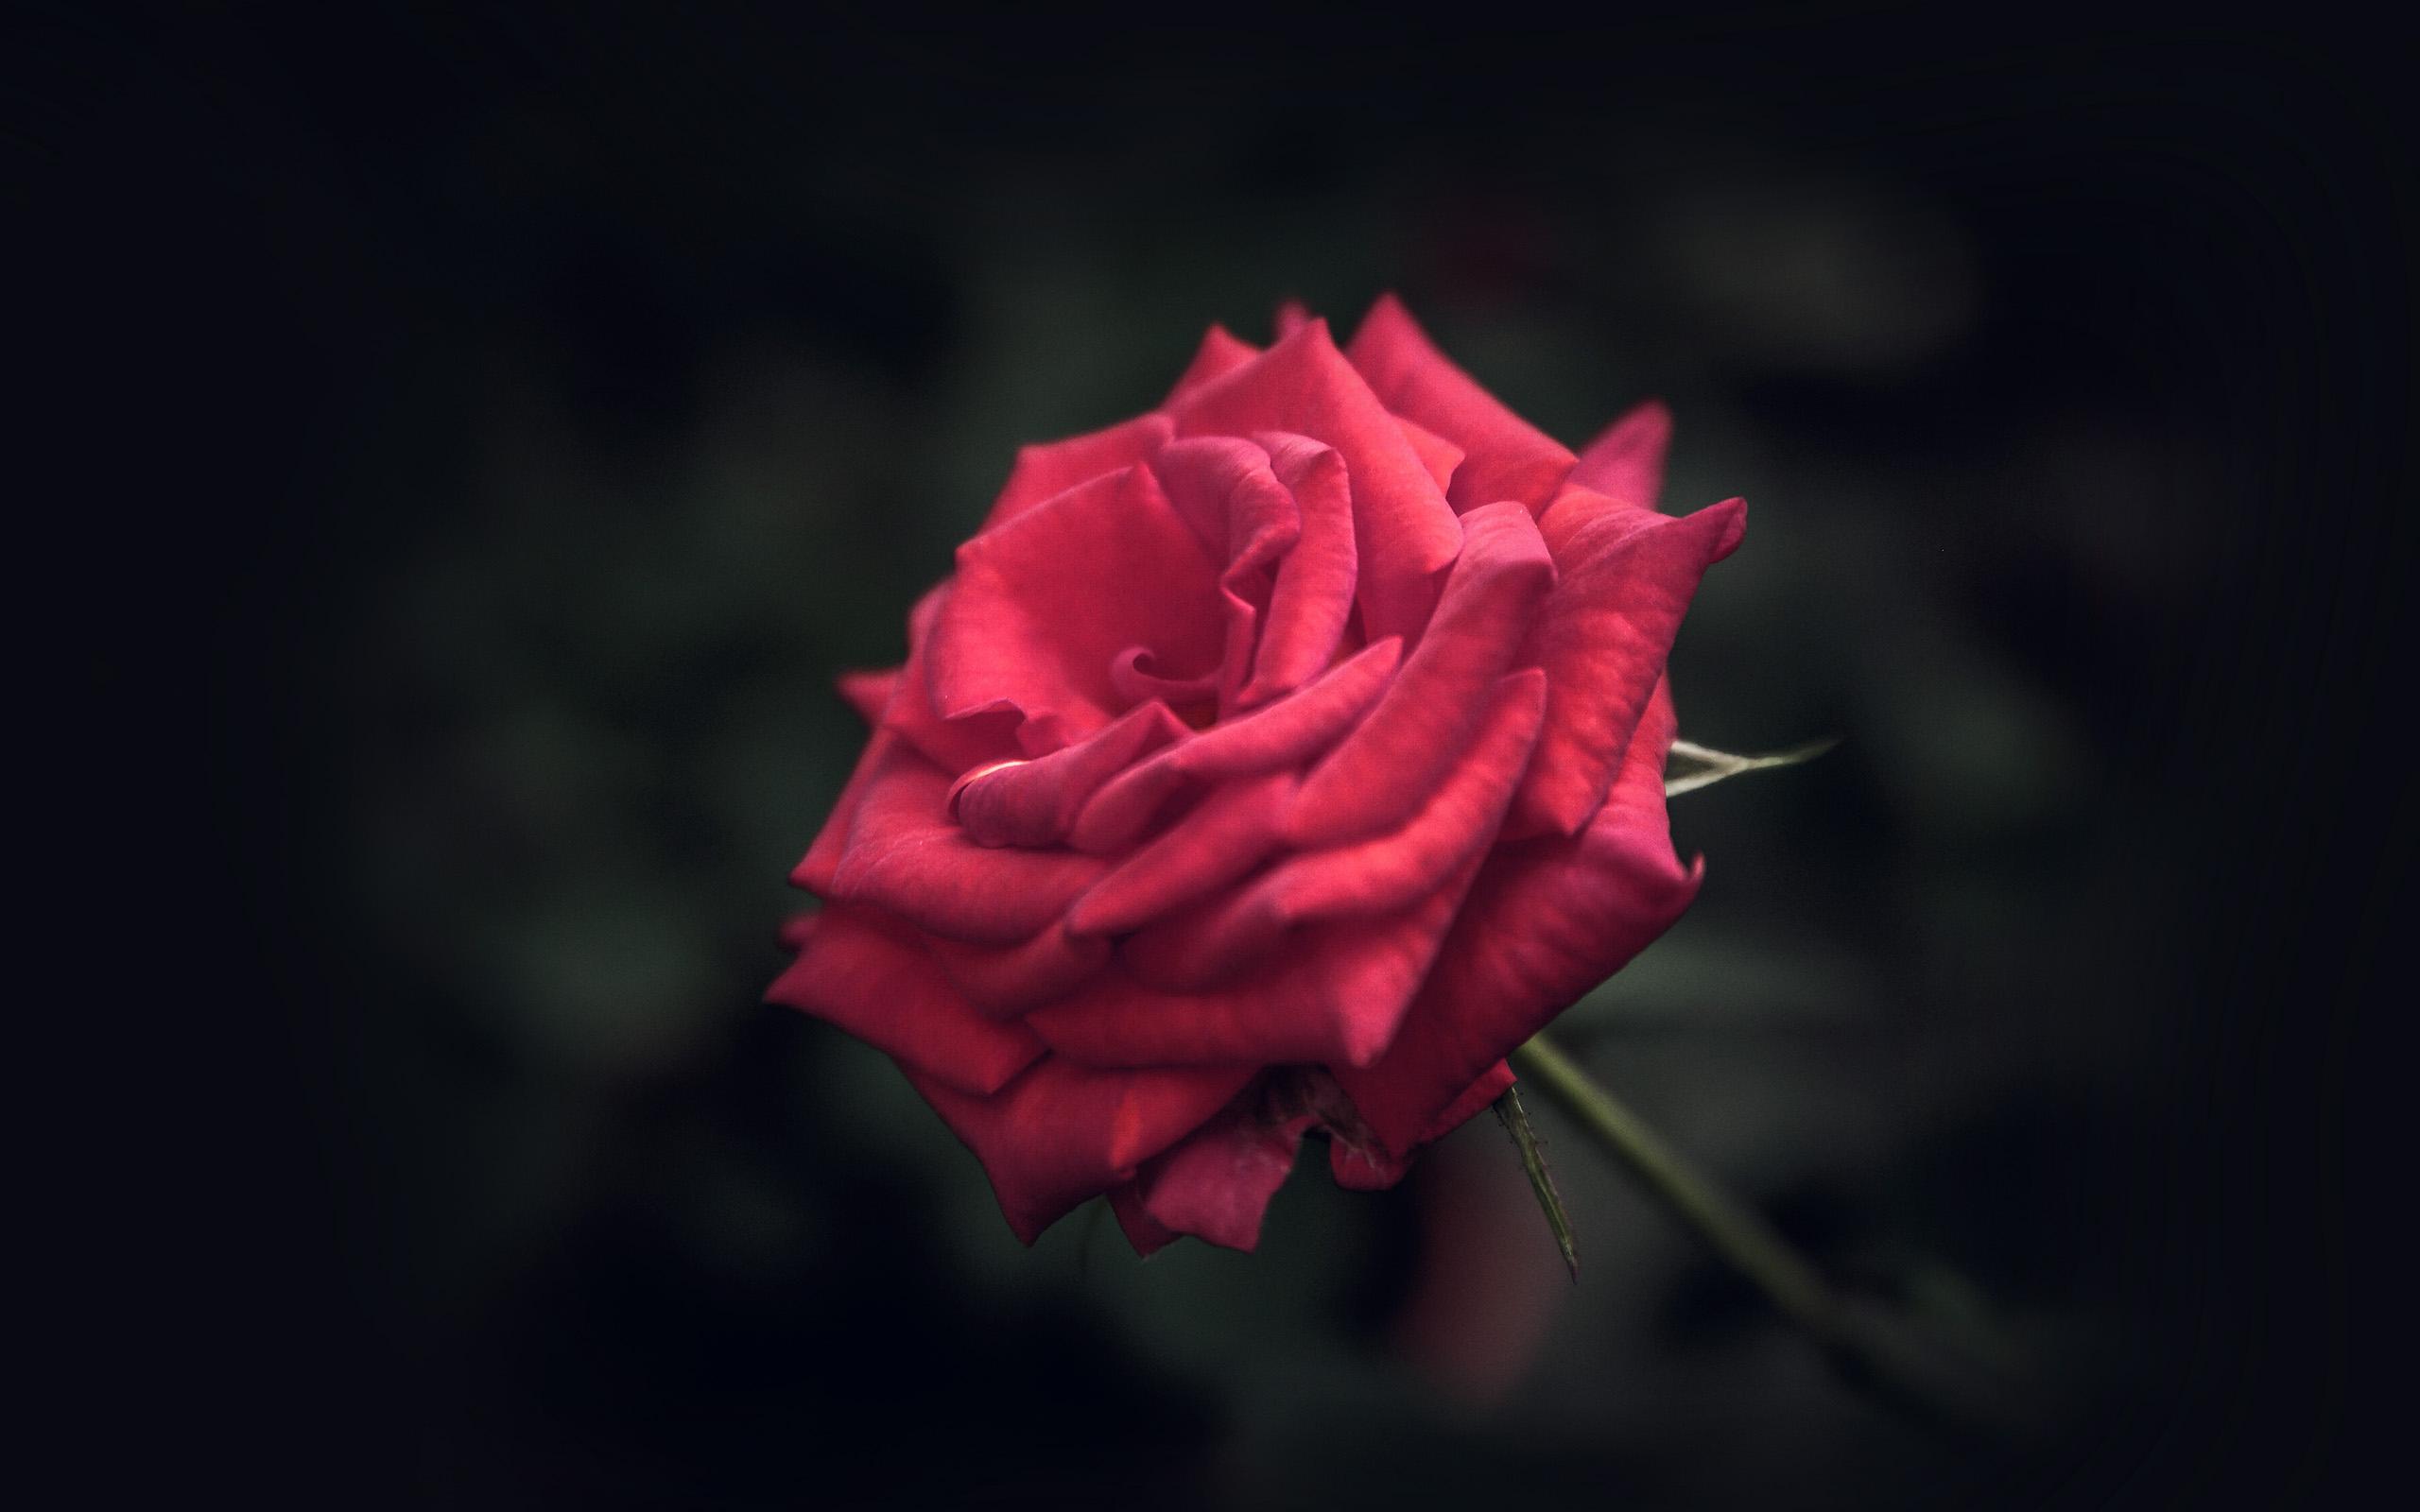 Wallpaper Desktop Girl Falling I Love Papers My31 Rose Flower Red Love Nature Blue